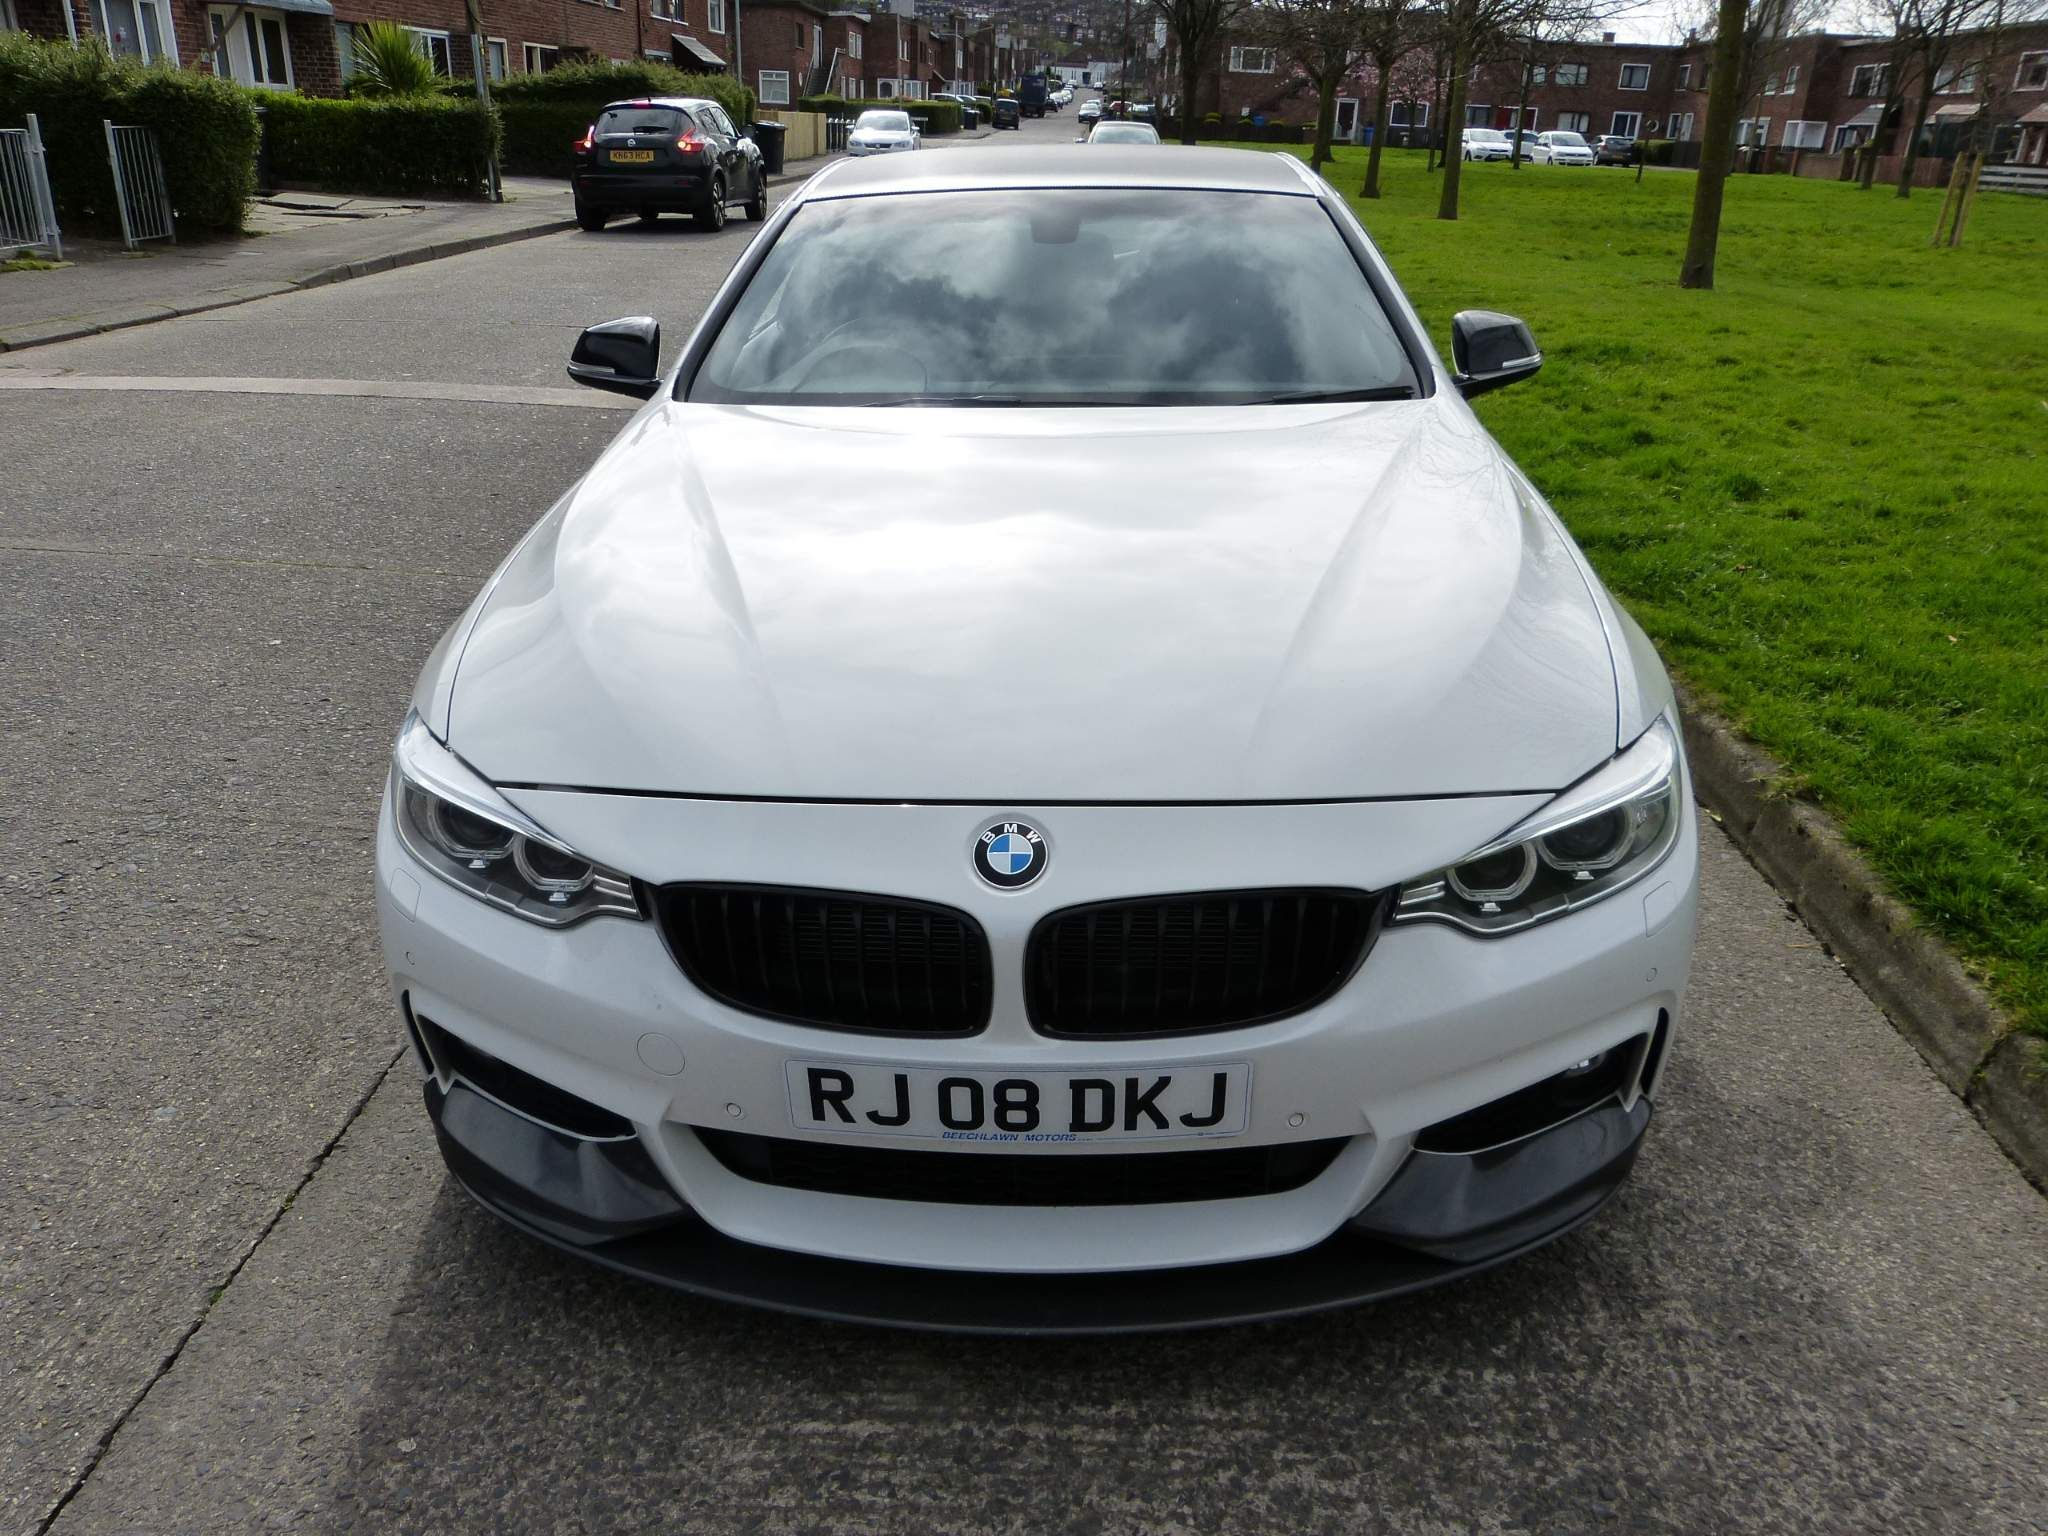 2014 BMW 4 Series 2.0 420d M Sport Auto Diesel Automatic performance package – Beechlawn Motors Belfast full